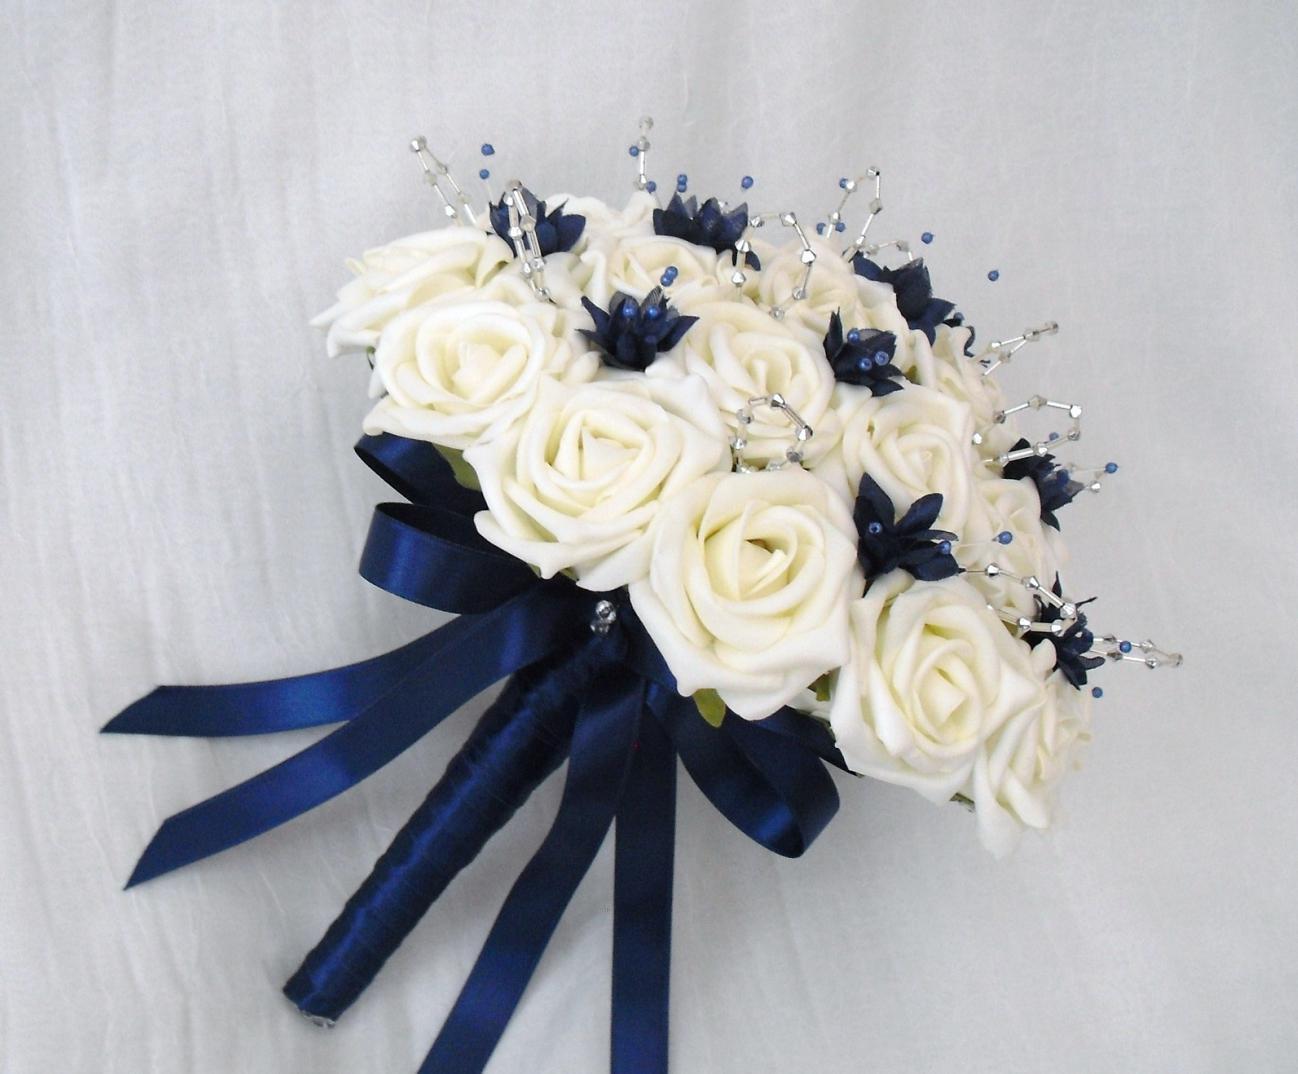 buchet mireasa cu trandafiri albi si albastru